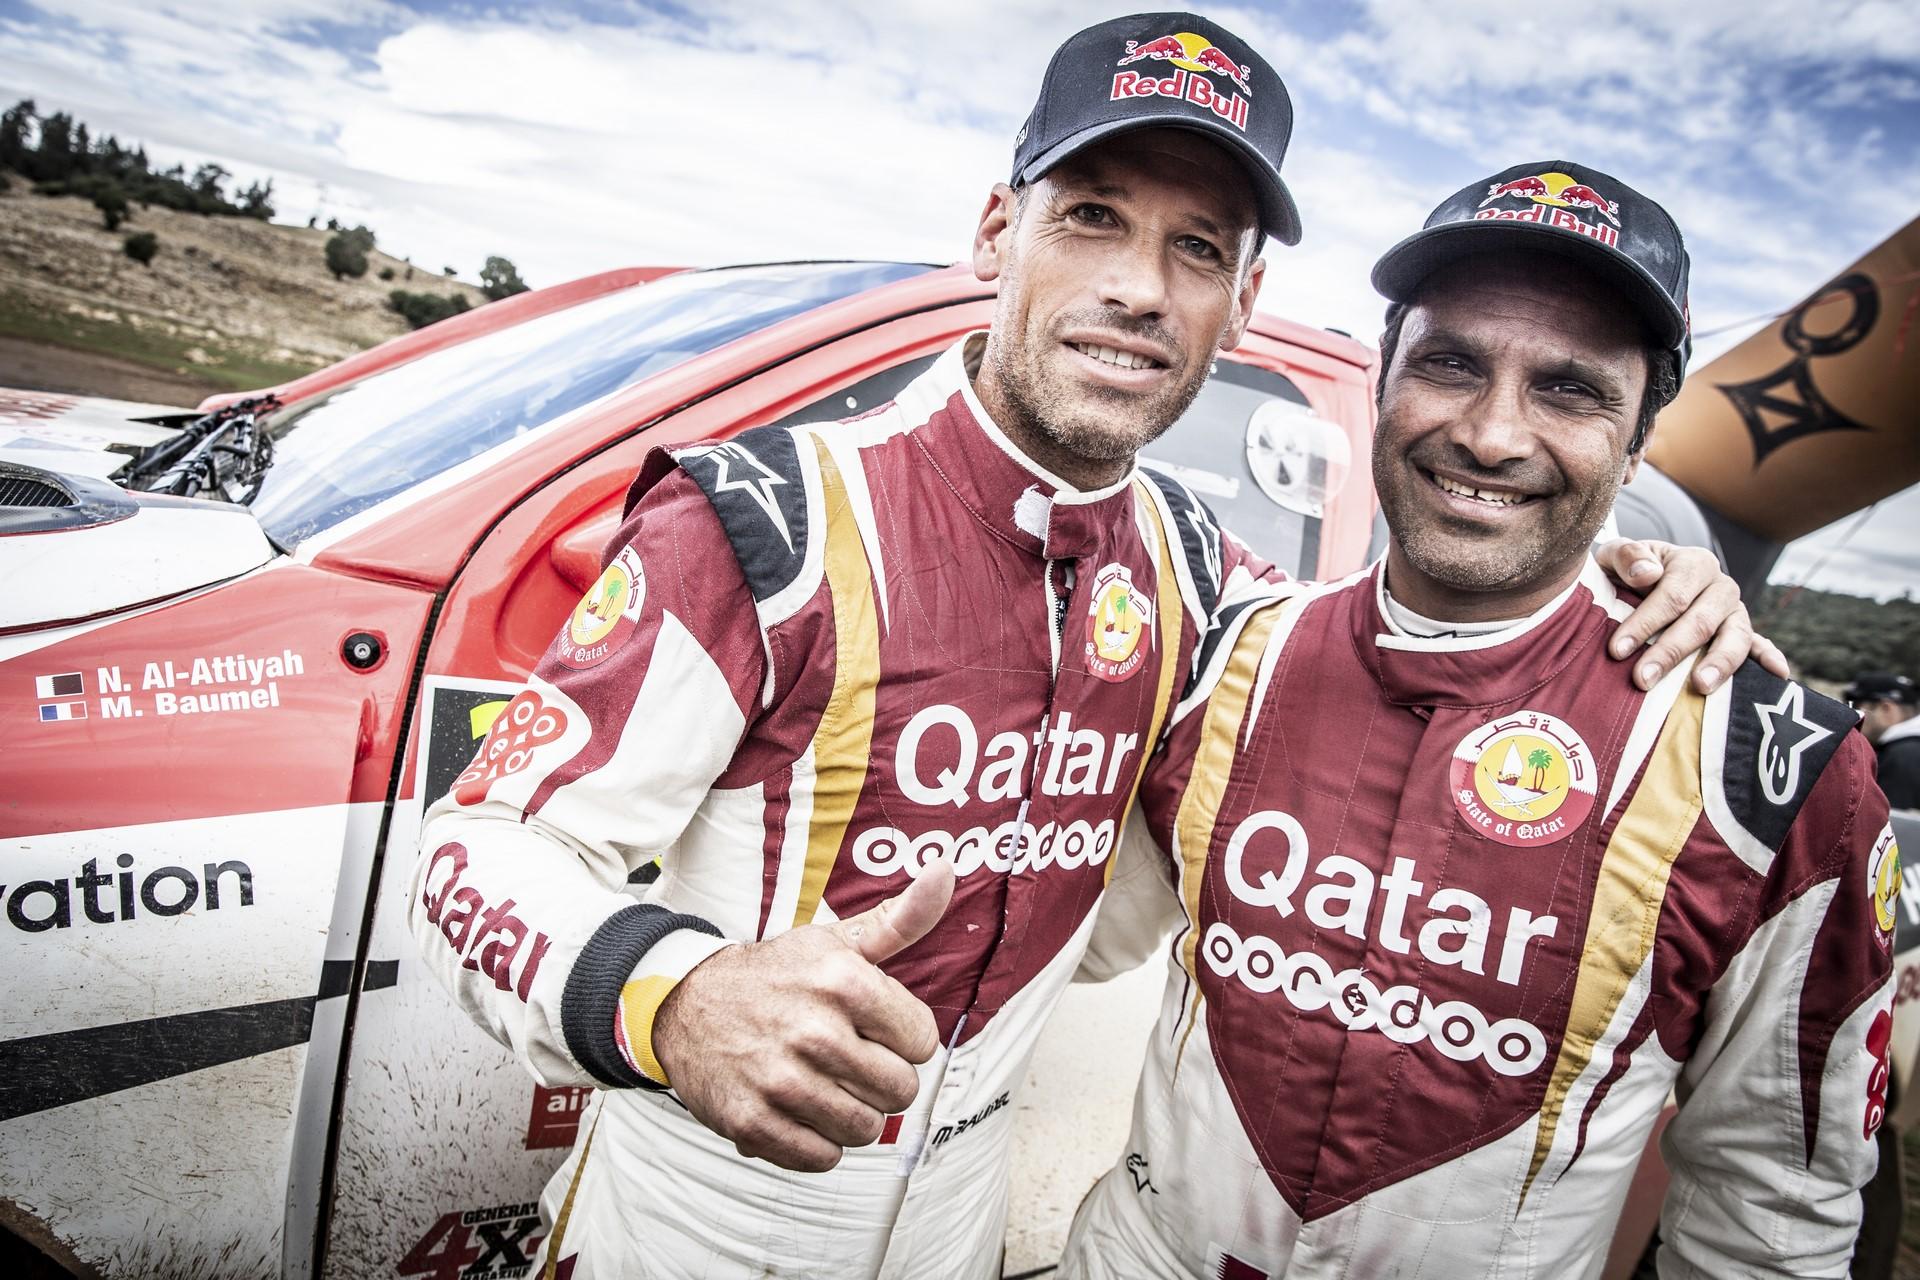 Nasser Al Attiyah & Matthieu Baumel at the finish line of Rally Du Maroc in Ifran, Morocco on October 09, 2018